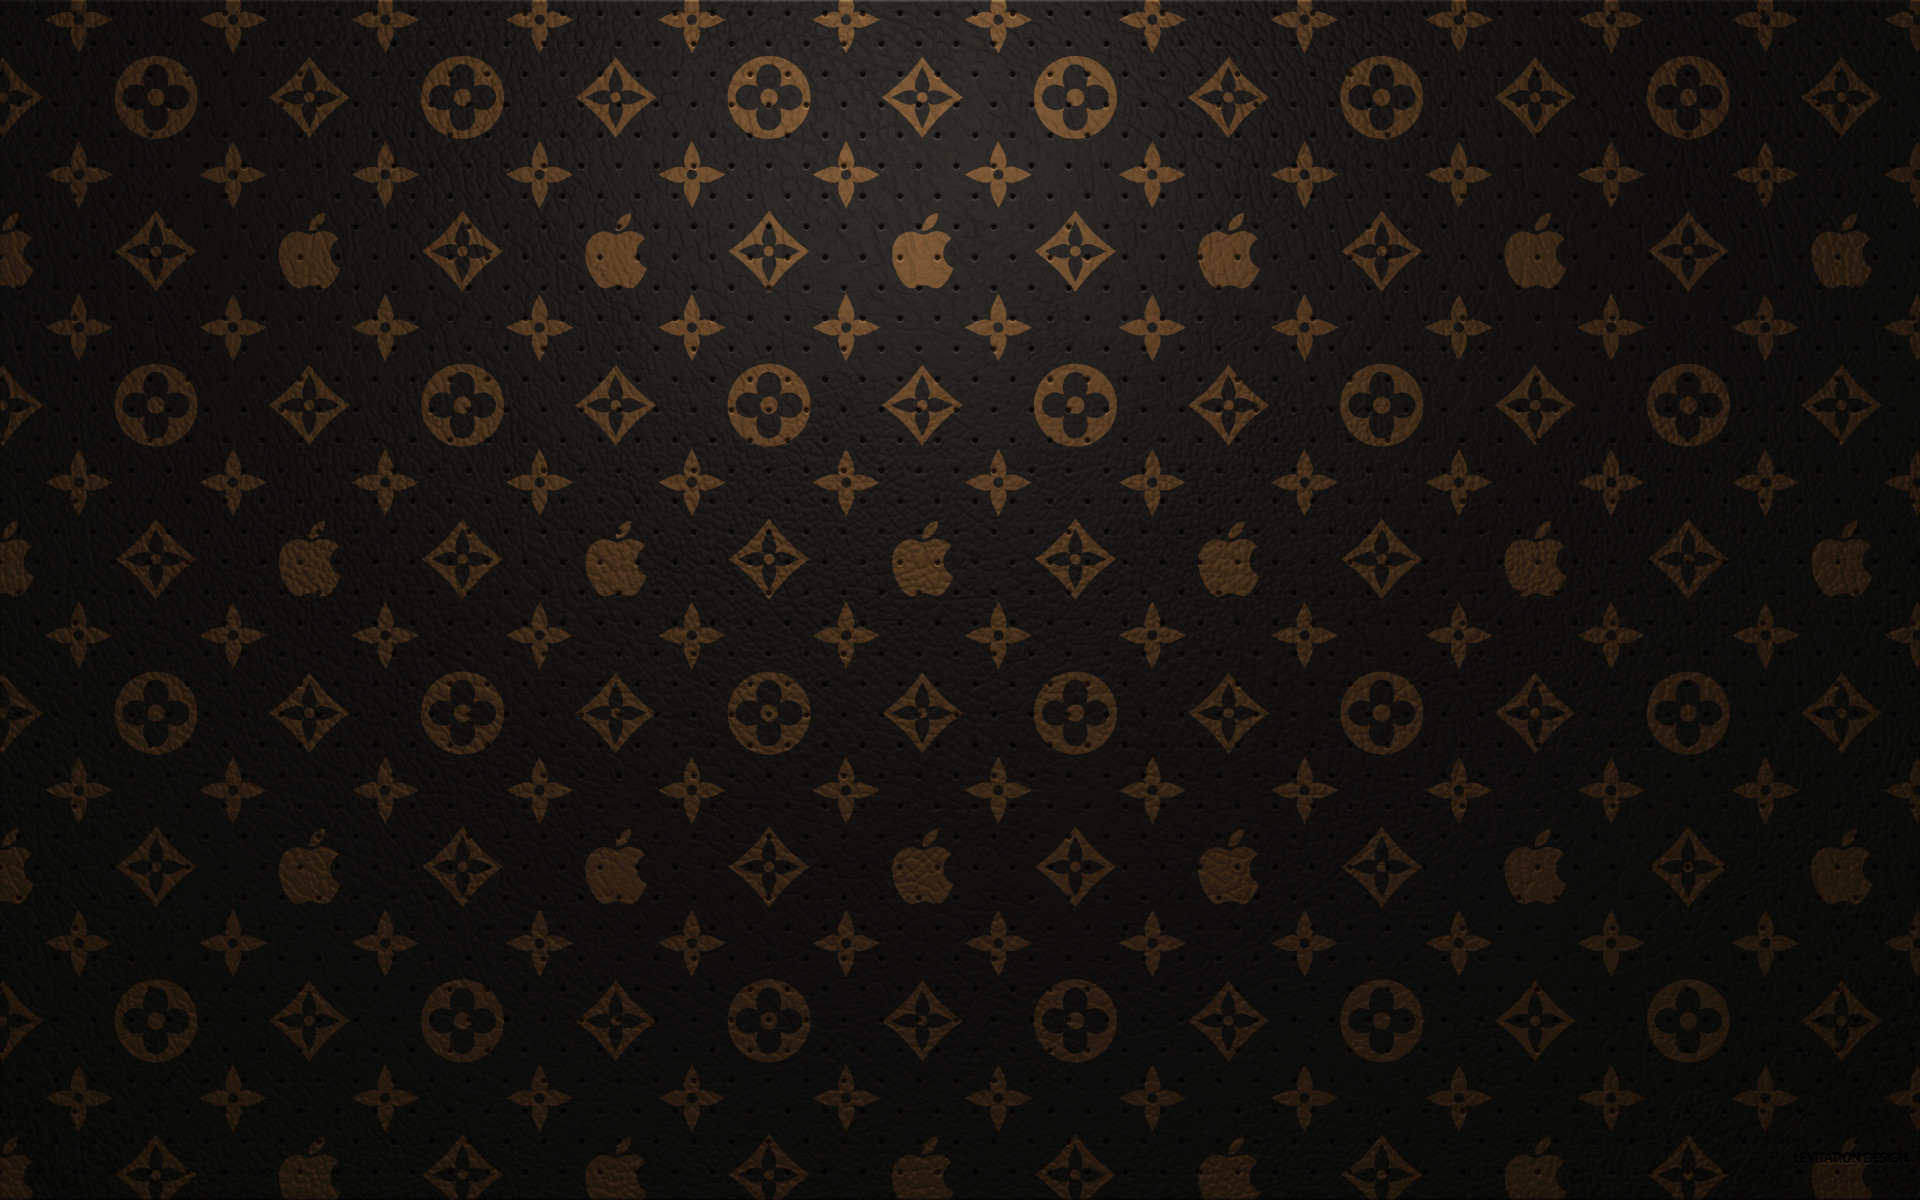 Louis Vuitton Wallpaper Hd High Resolution Bolsos For Wallpaper